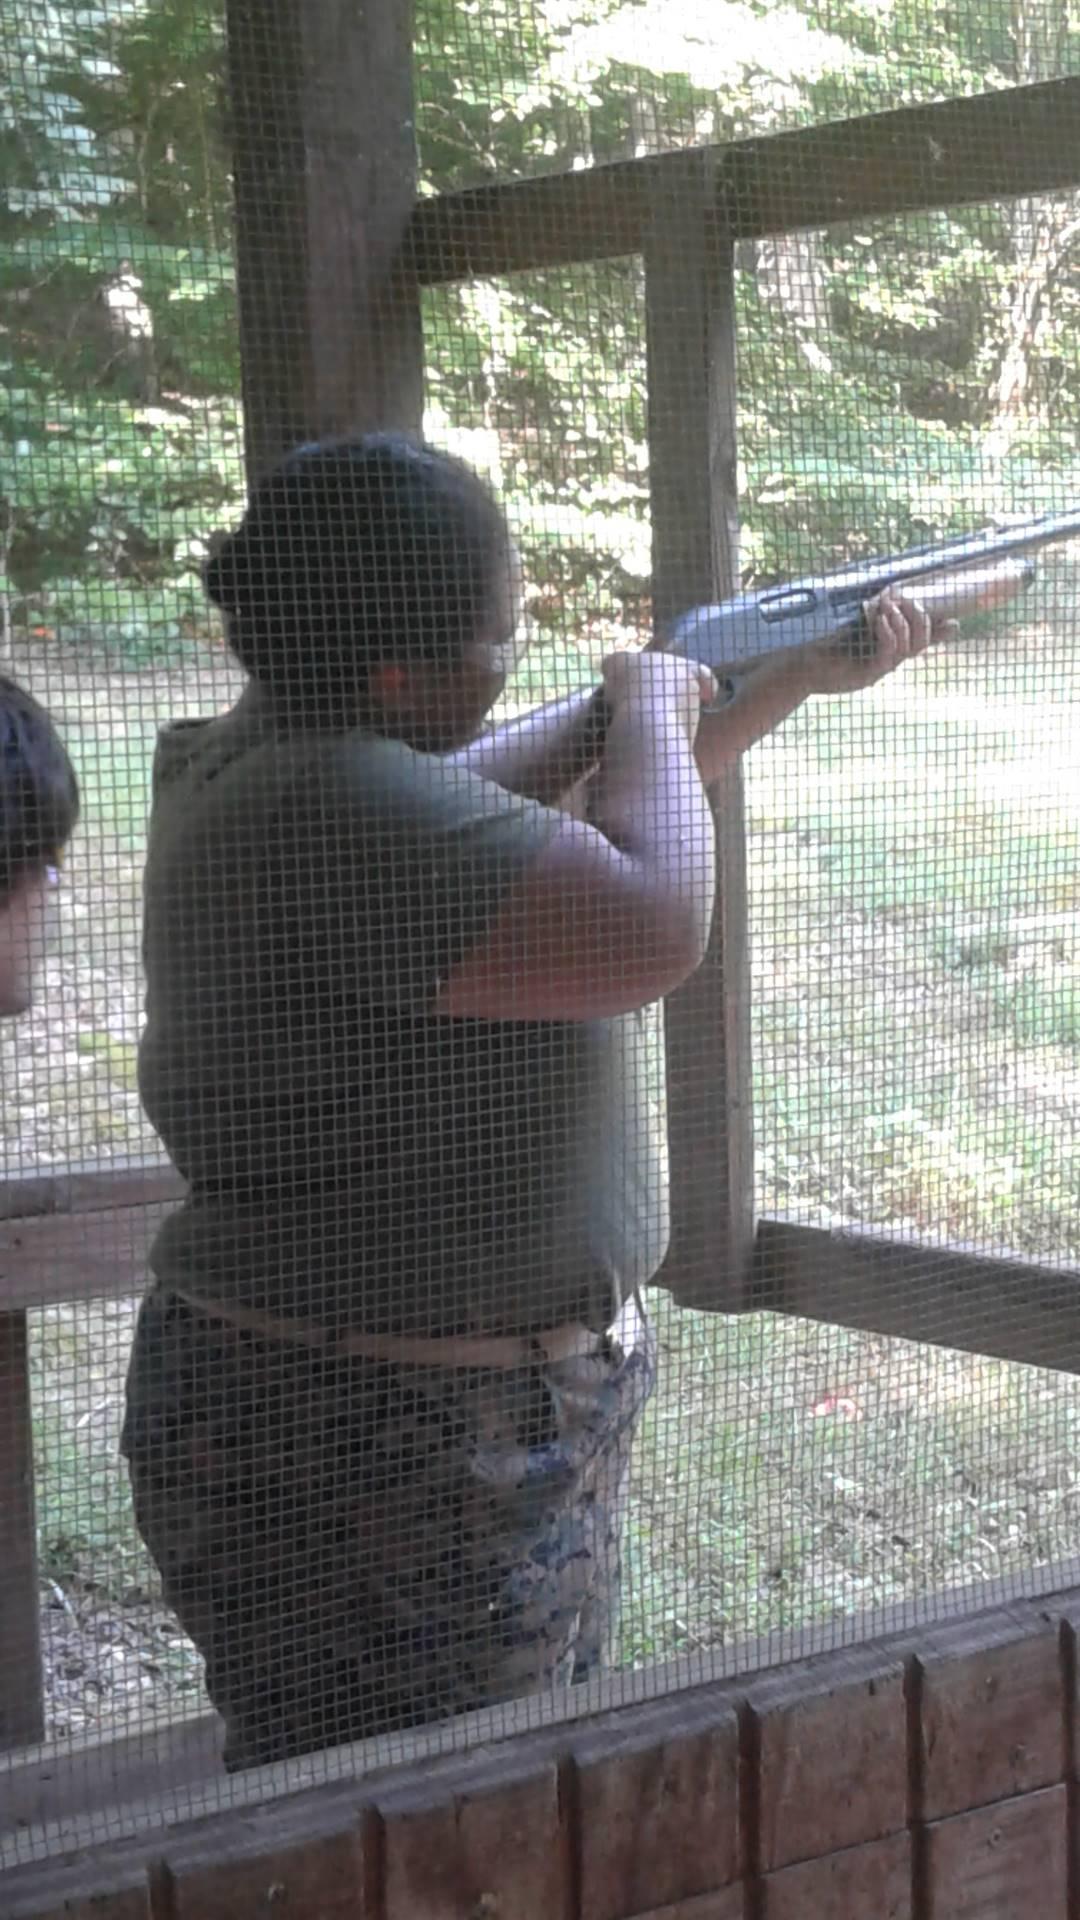 Cadet Maxwell on the skeet range